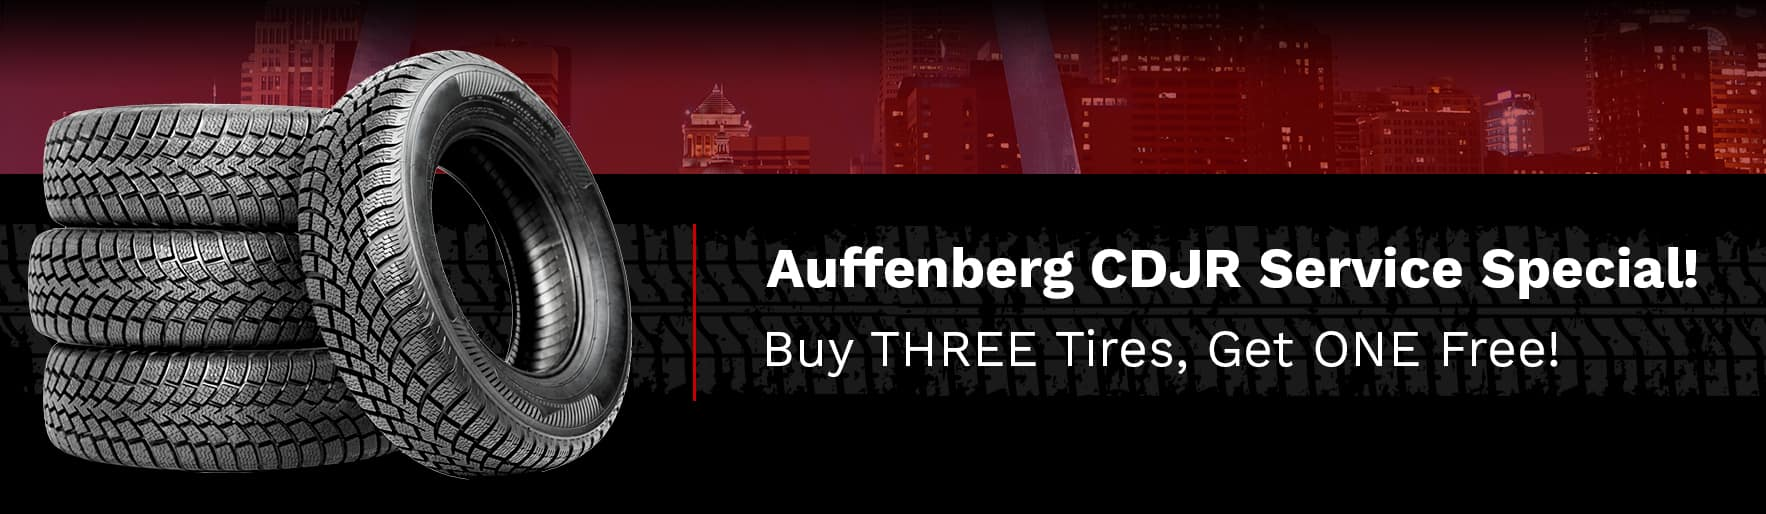 Auffenberg CDJR Tire Special